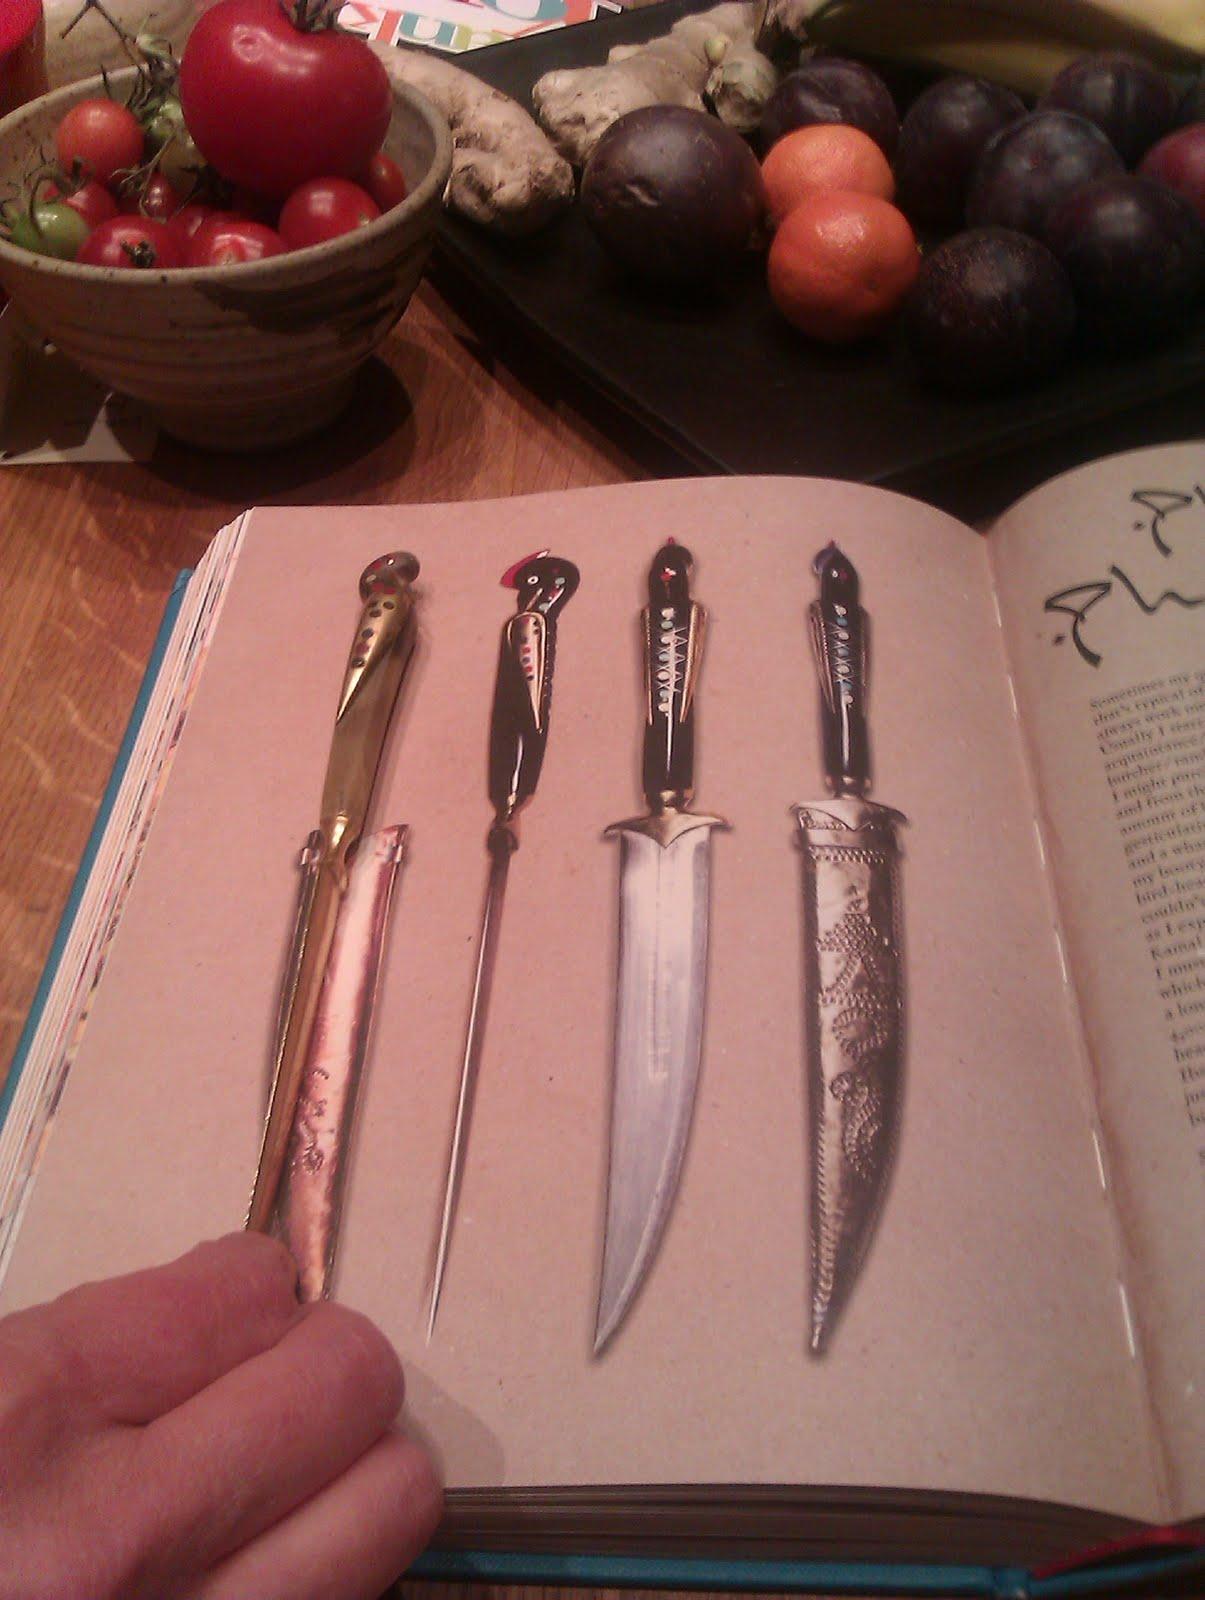 Bringing Kitchen Knives Into Uk